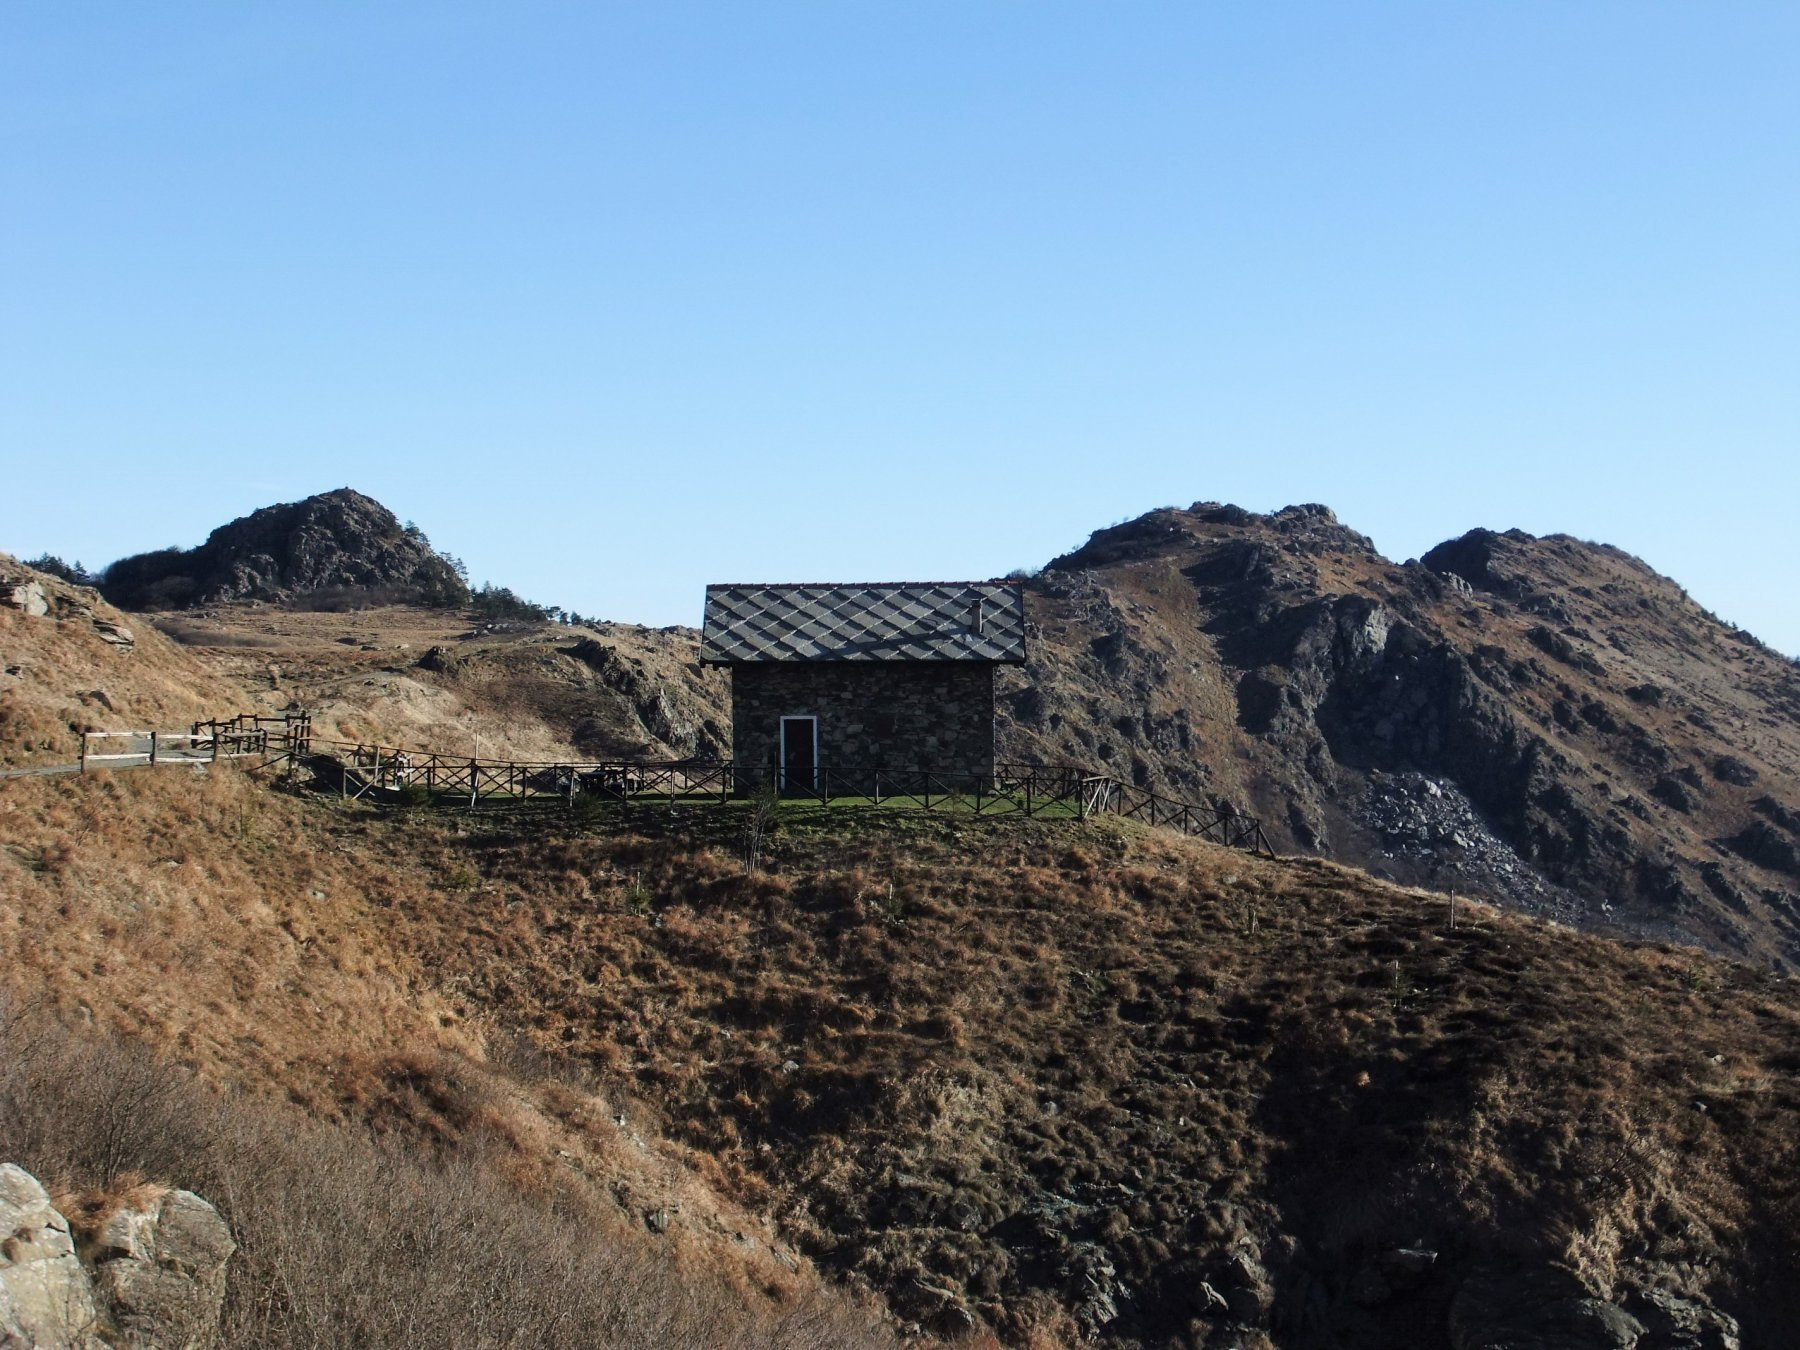 Casa Miniera e Monte Rama a destra